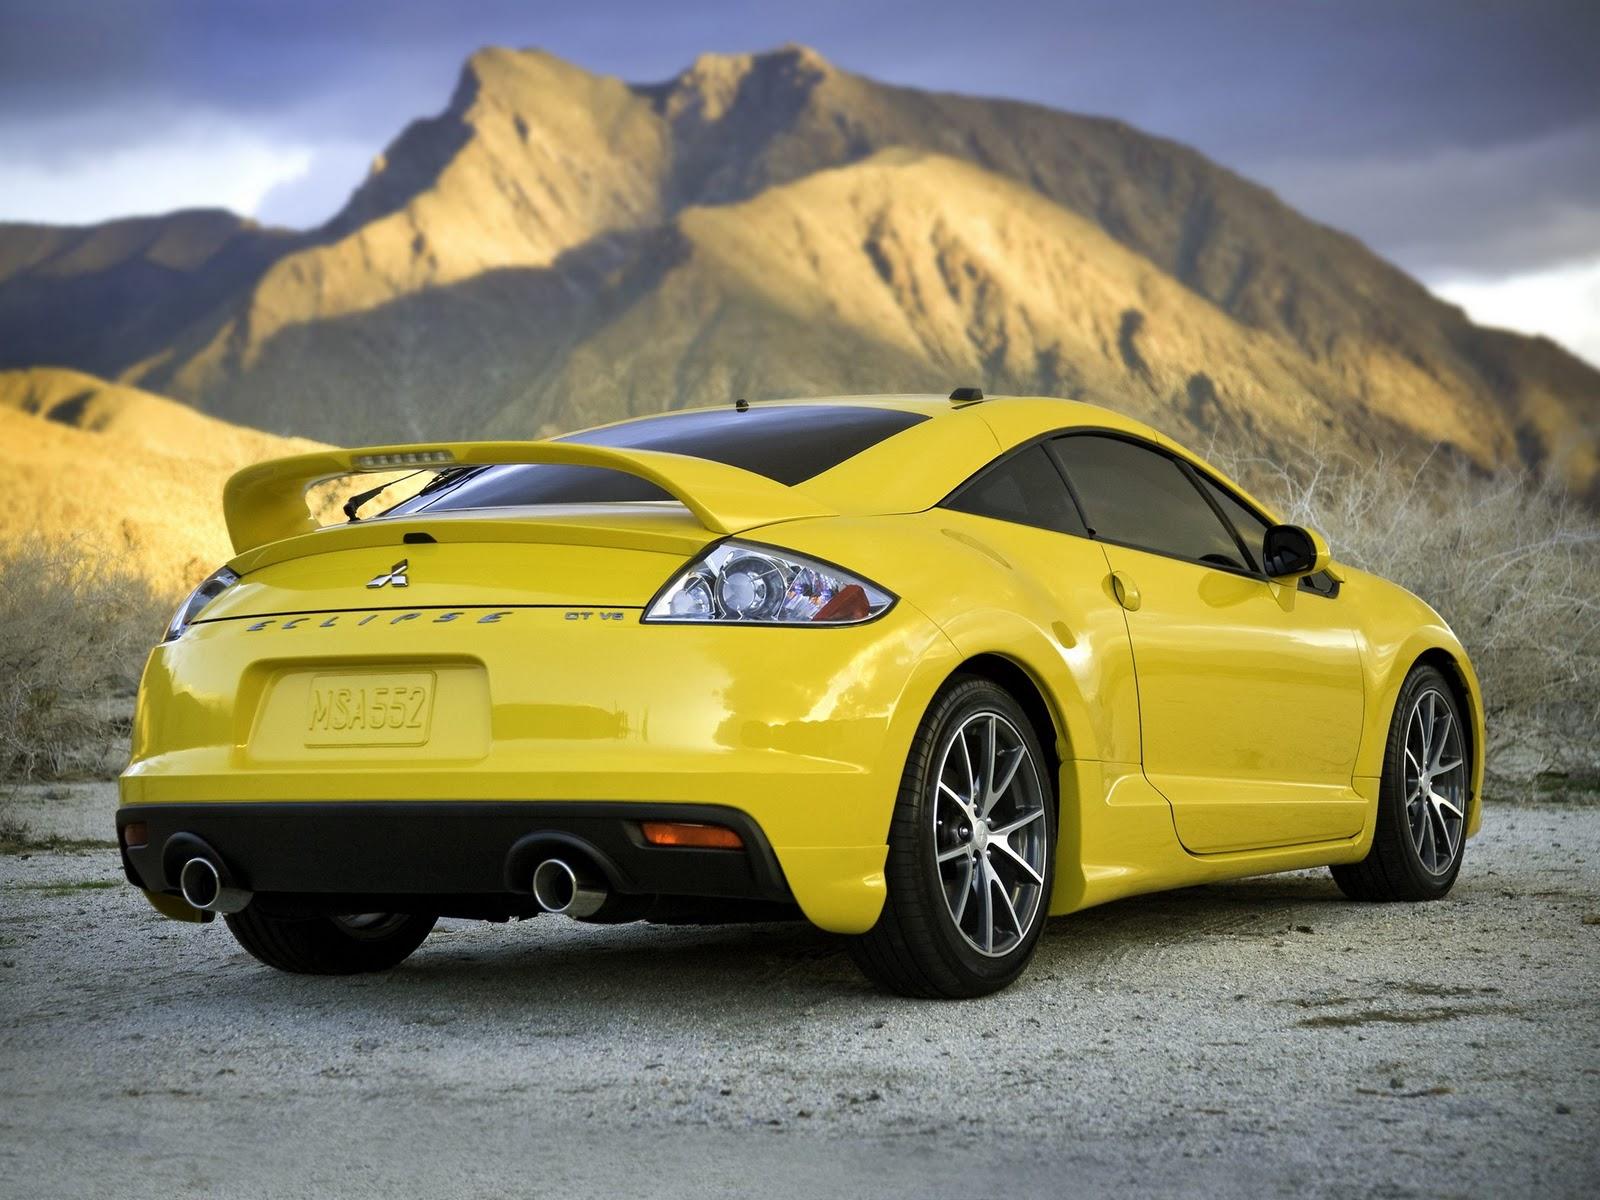 Gambar Mobil Mitsubishi Eclipse yellow